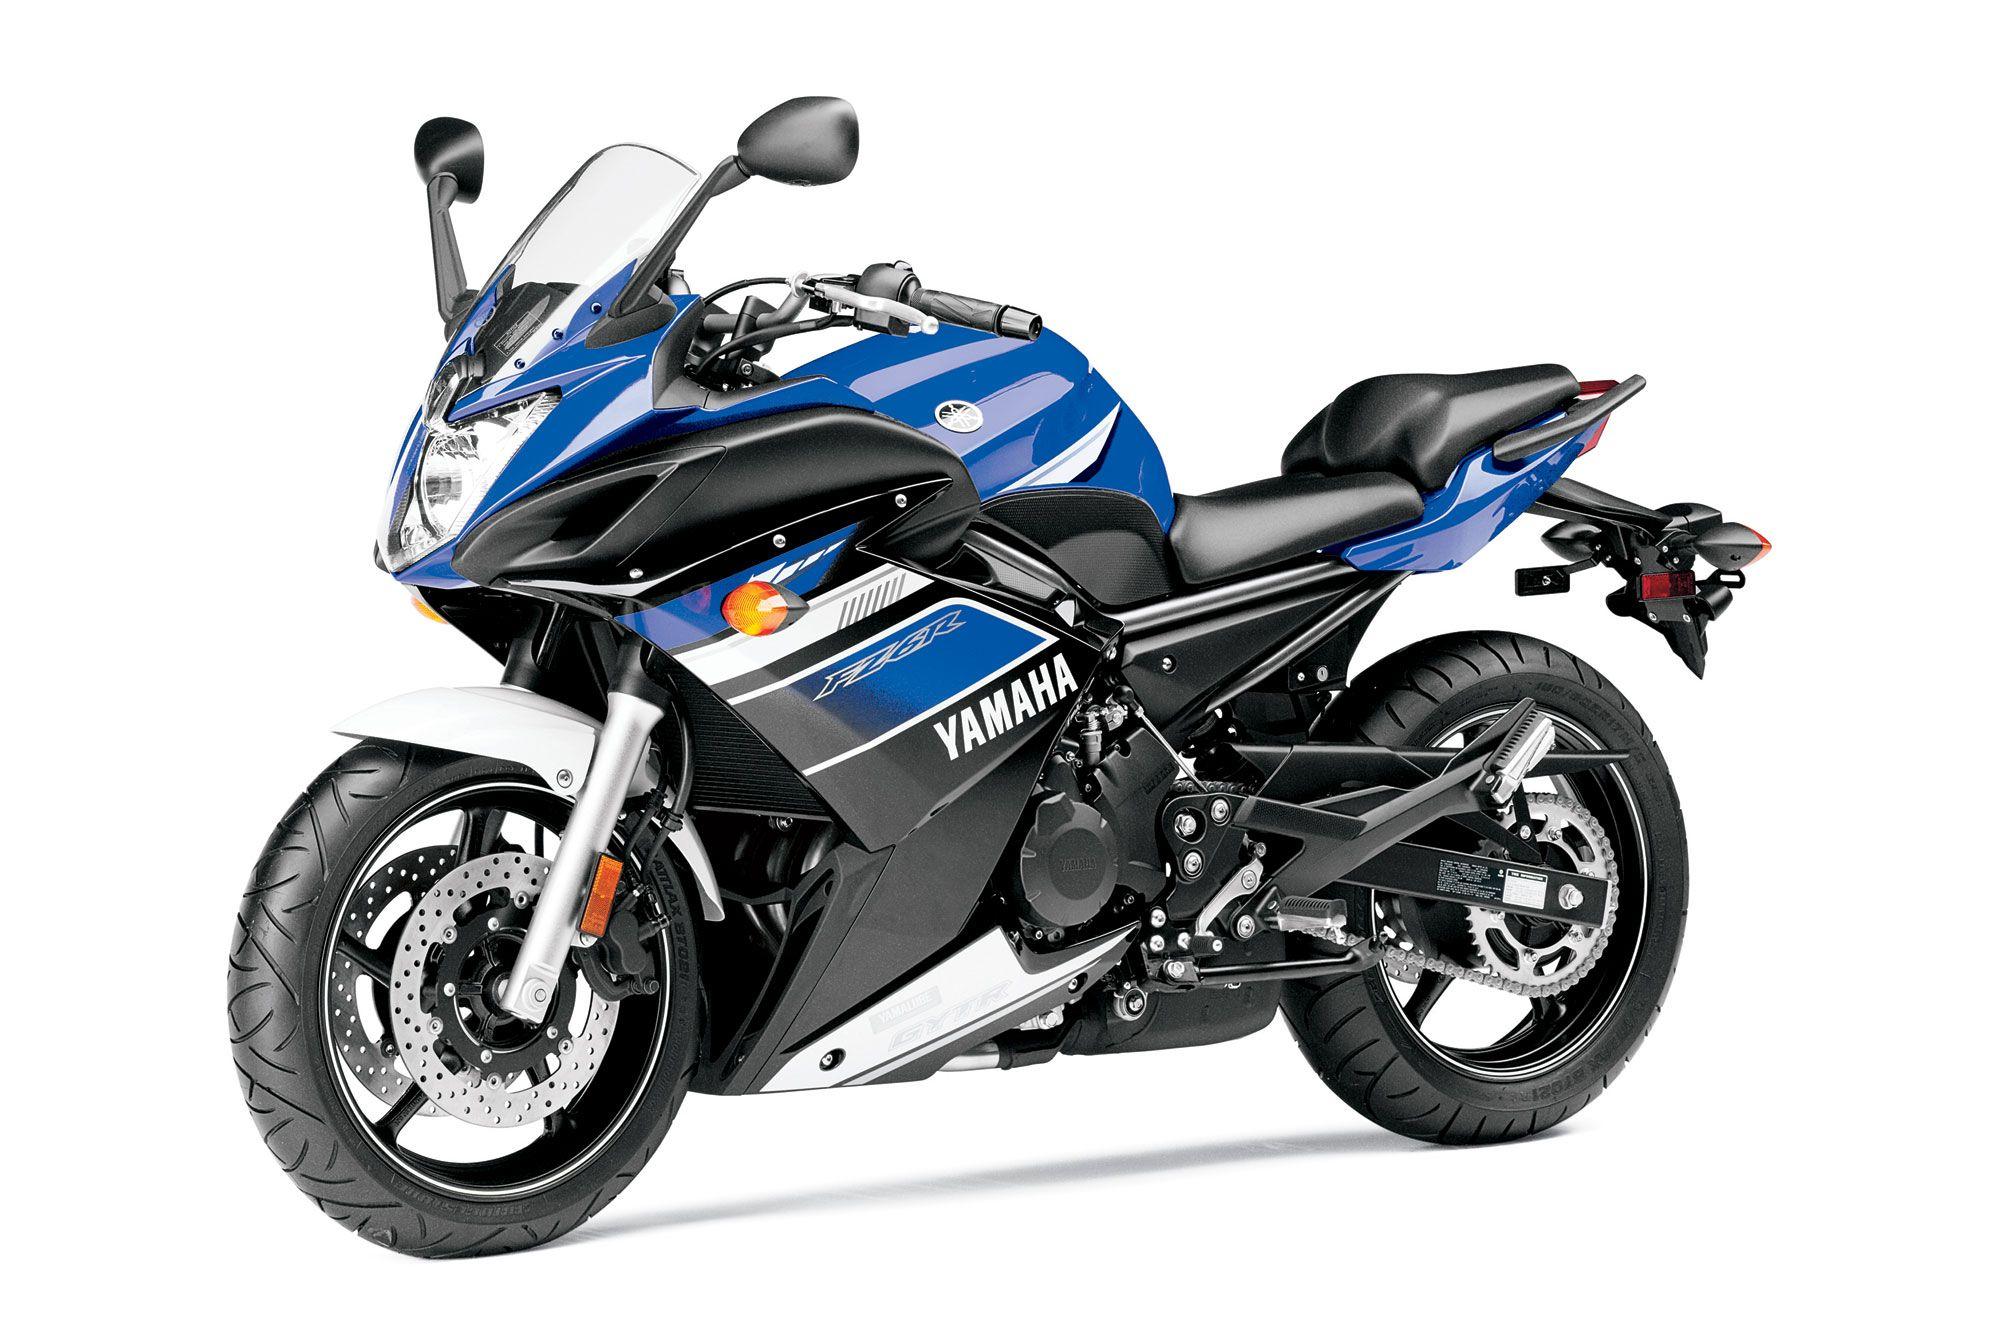 Yamaha Fz6r White Motorcycle Yamaha Motorcycles For Sale